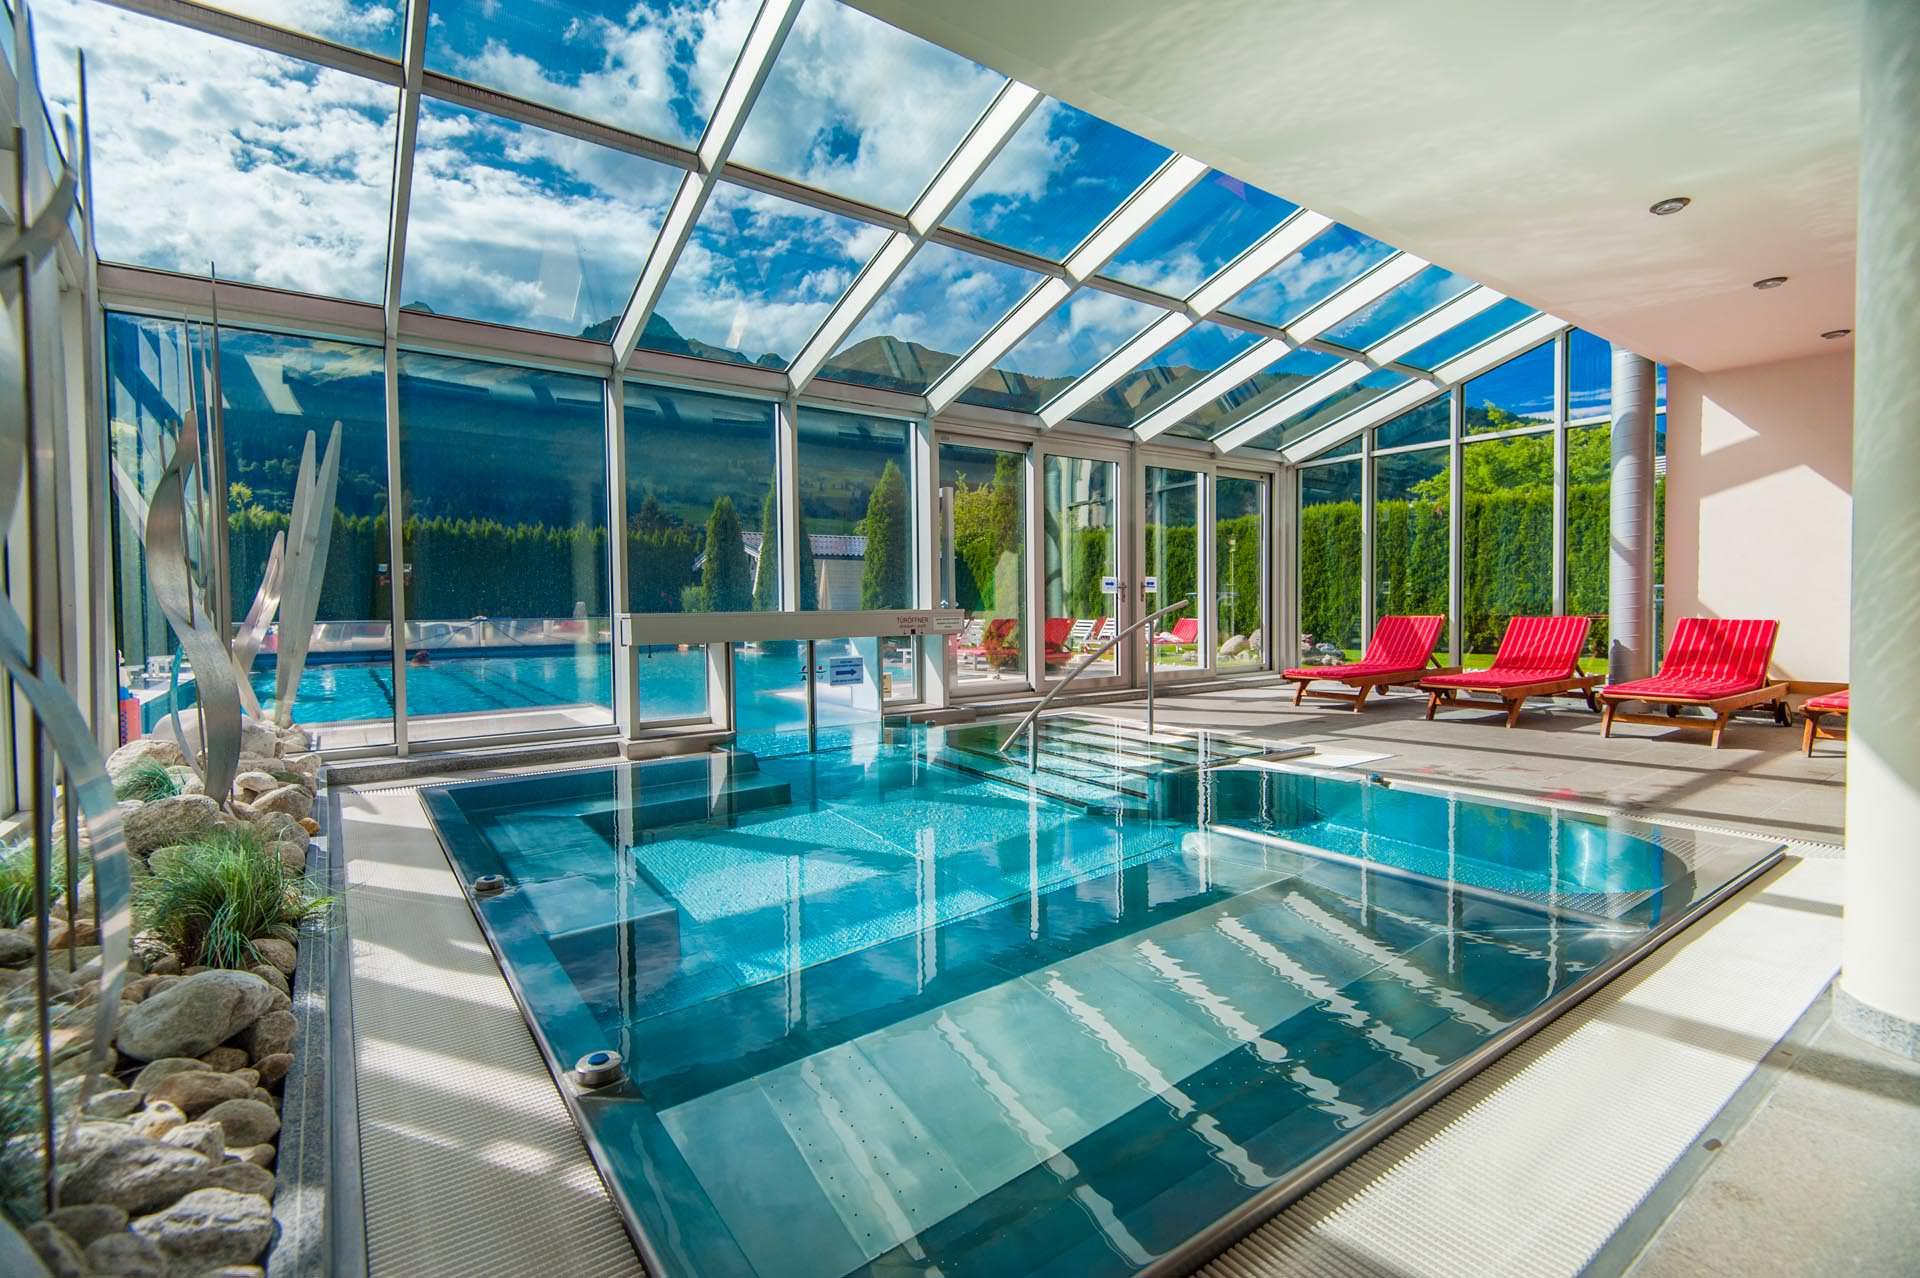 Impuls hotel tirol 4 s wellnesshotel in bad hofgastein for Hotel design tirol